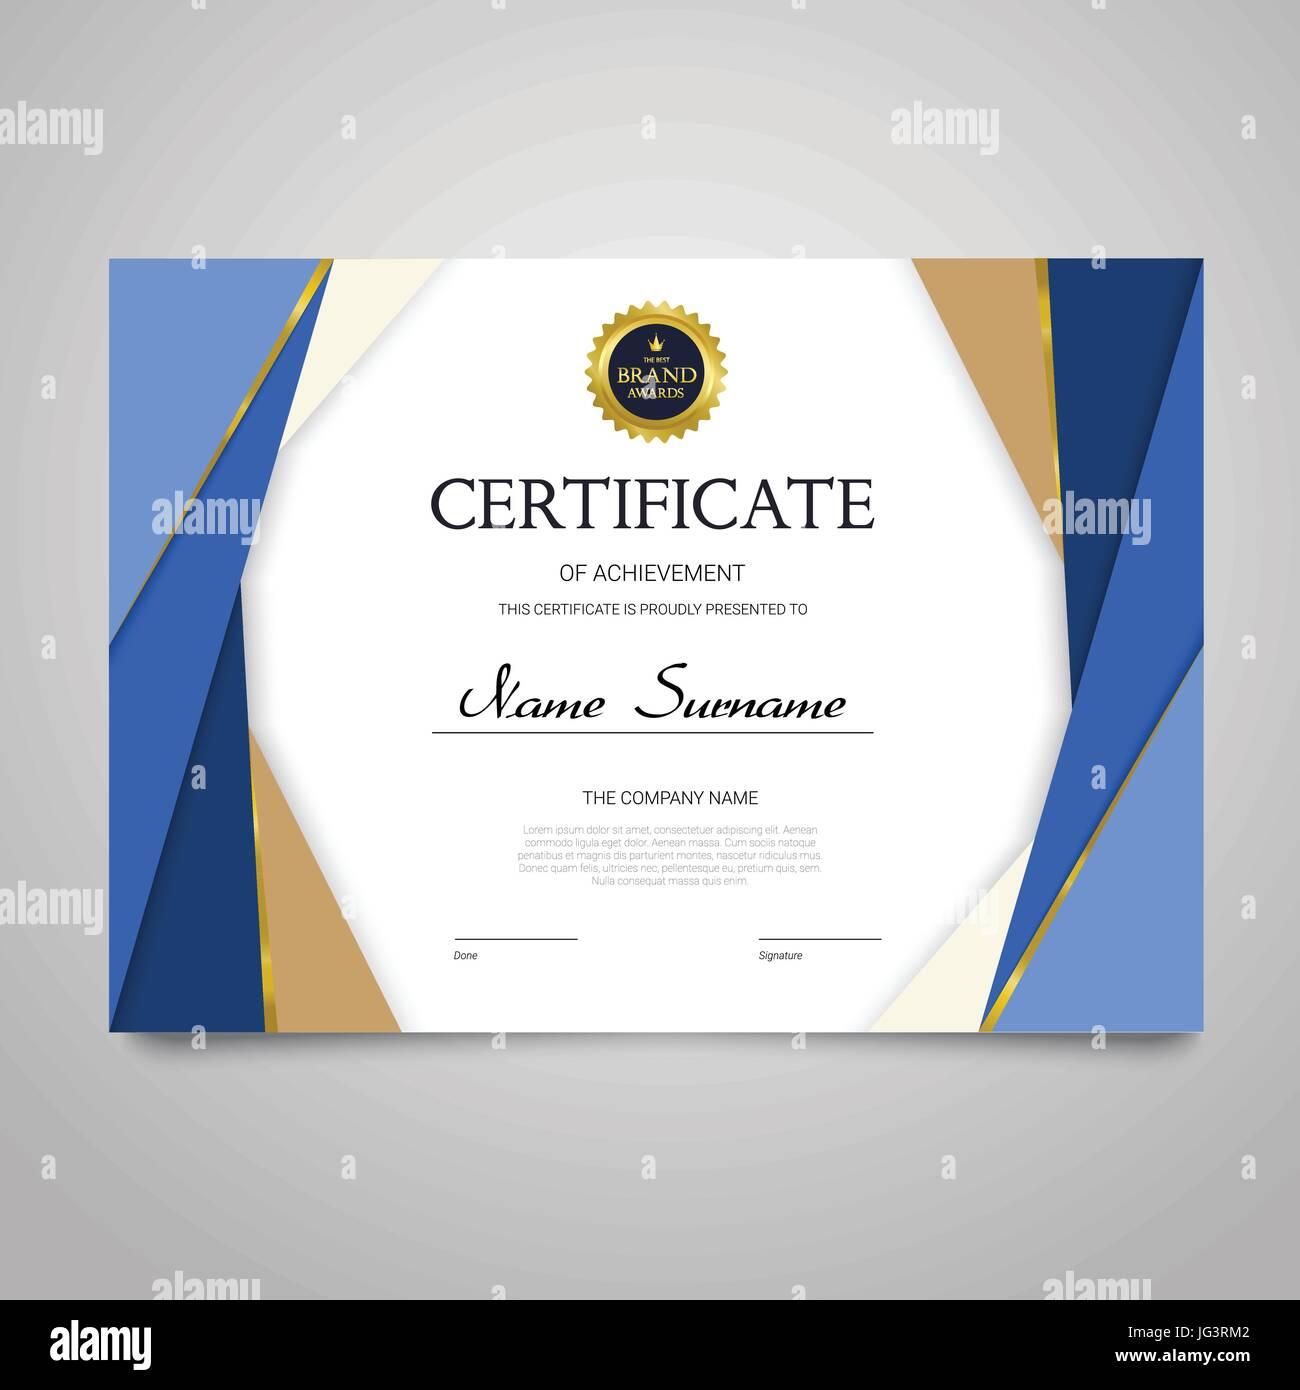 certificate template modern horizontal elegant vector document  certificate template modern horizontal elegant vector document luxury design diploma of achievement appreciation copy space for su